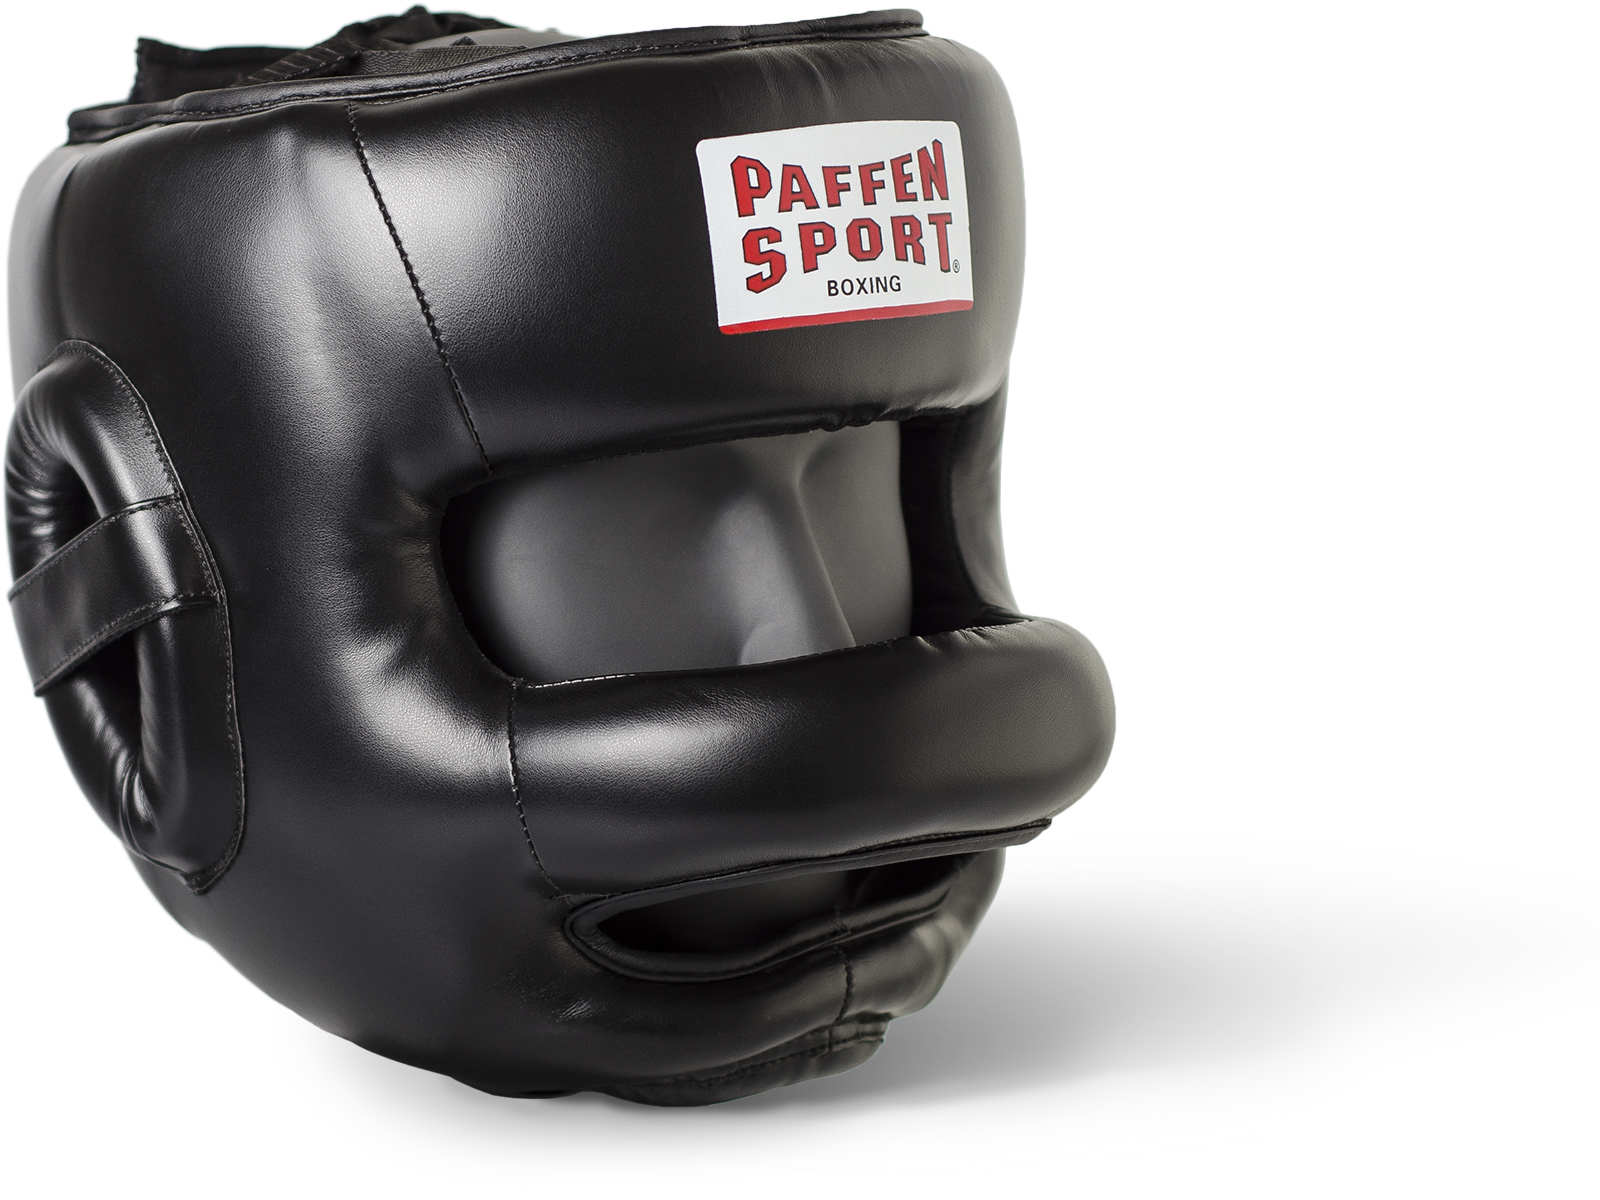 Шлем с бампером для бокса Paffen sport